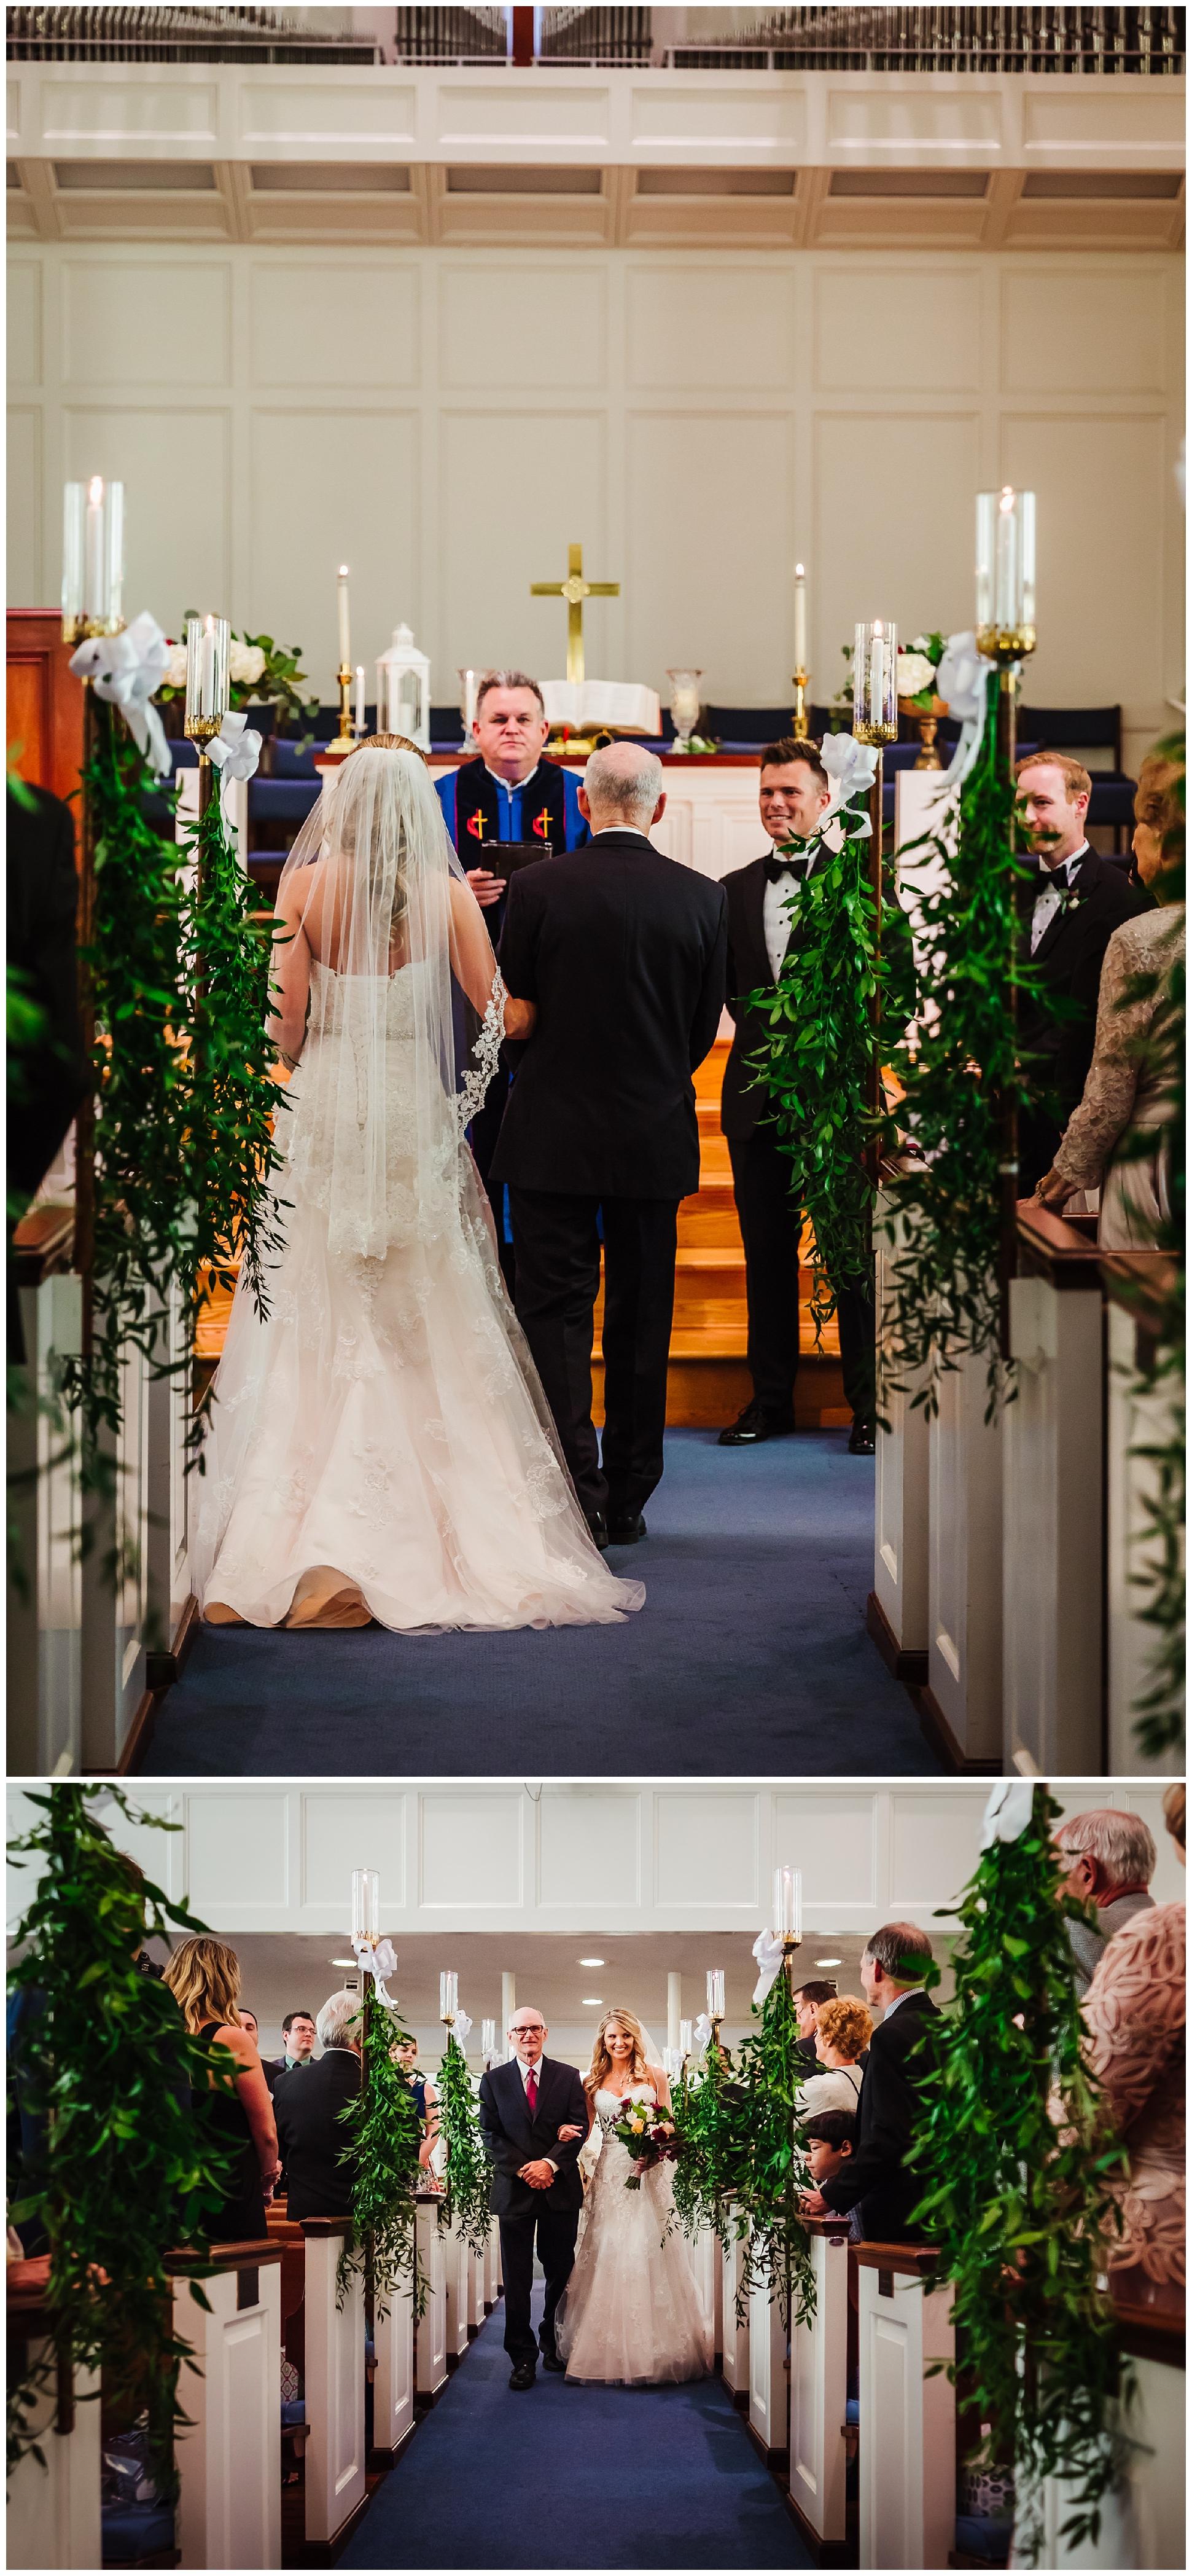 tampa-bradenton-wedding-photographer-south-florida-museum-classic-blush-gold-alpacas-sparklers_0047.jpg